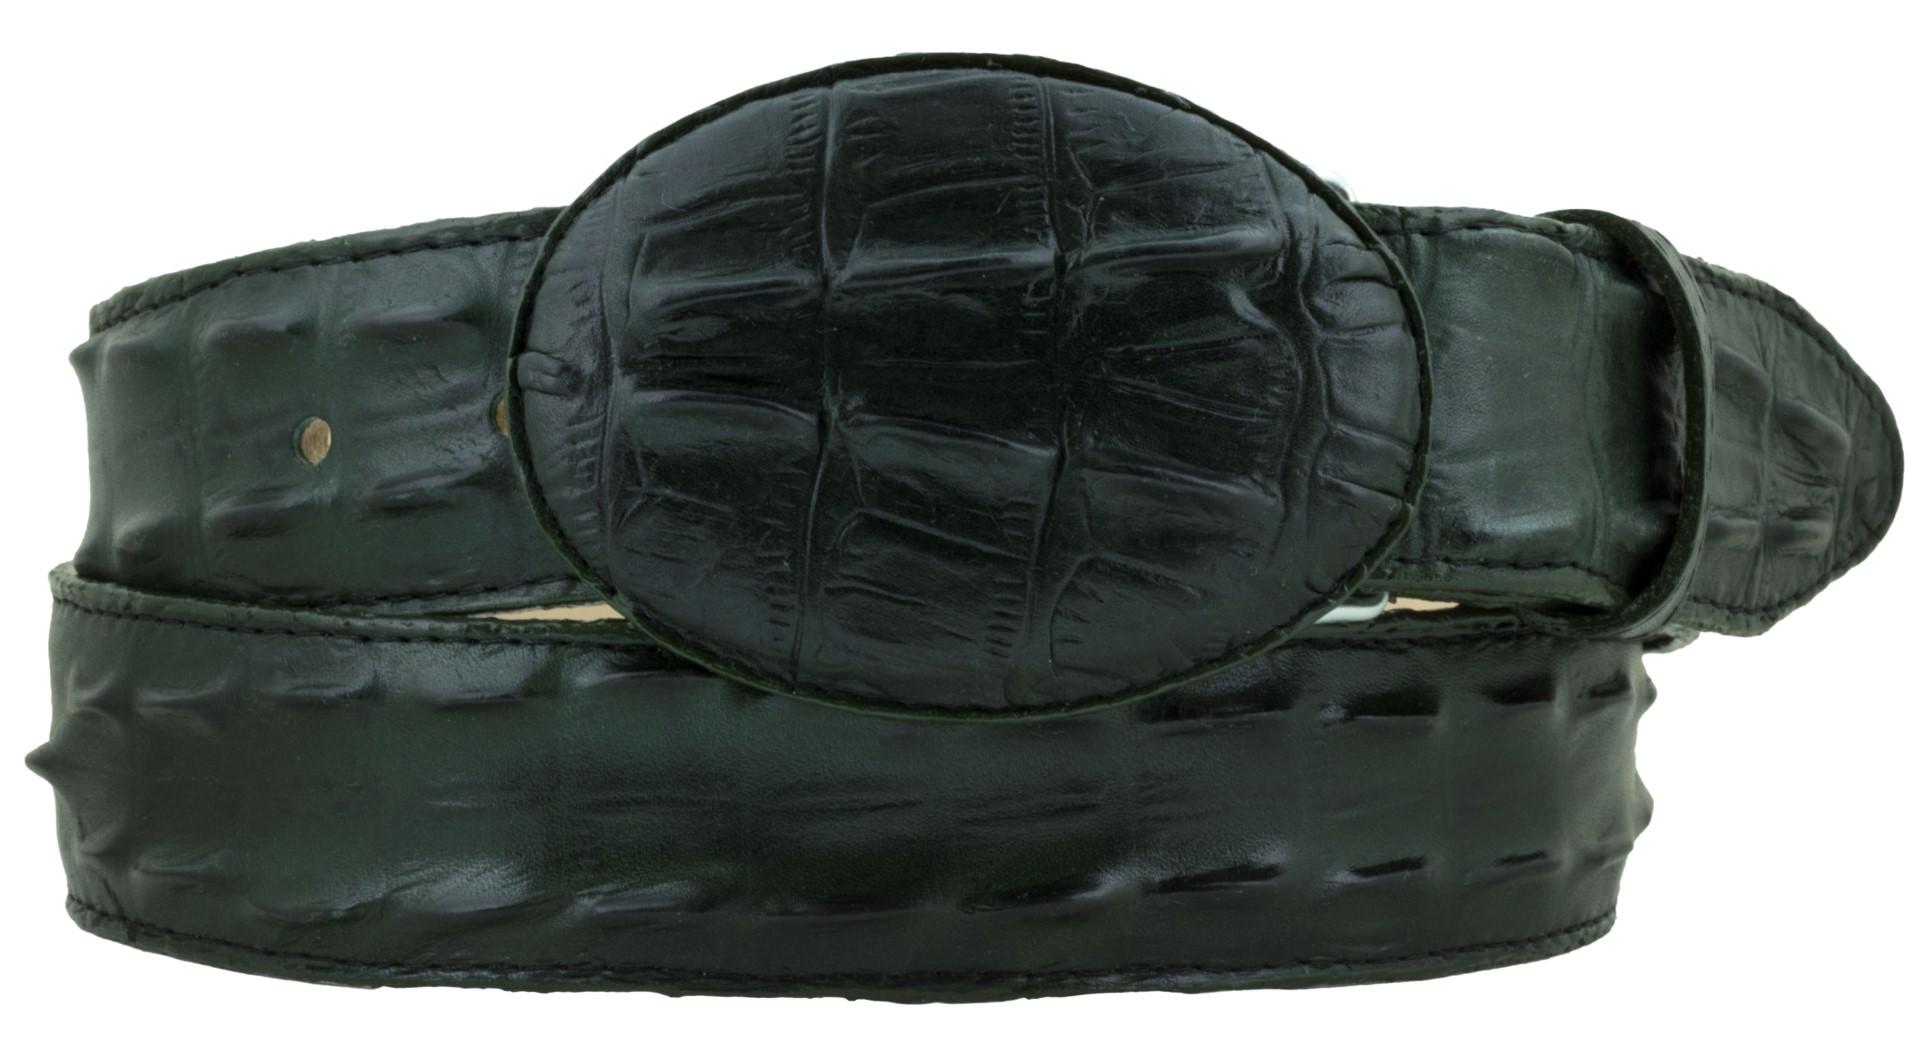 Mens Crocodile Tail Belt Print Leather Western Dress Black Cherry Buckle Cinto